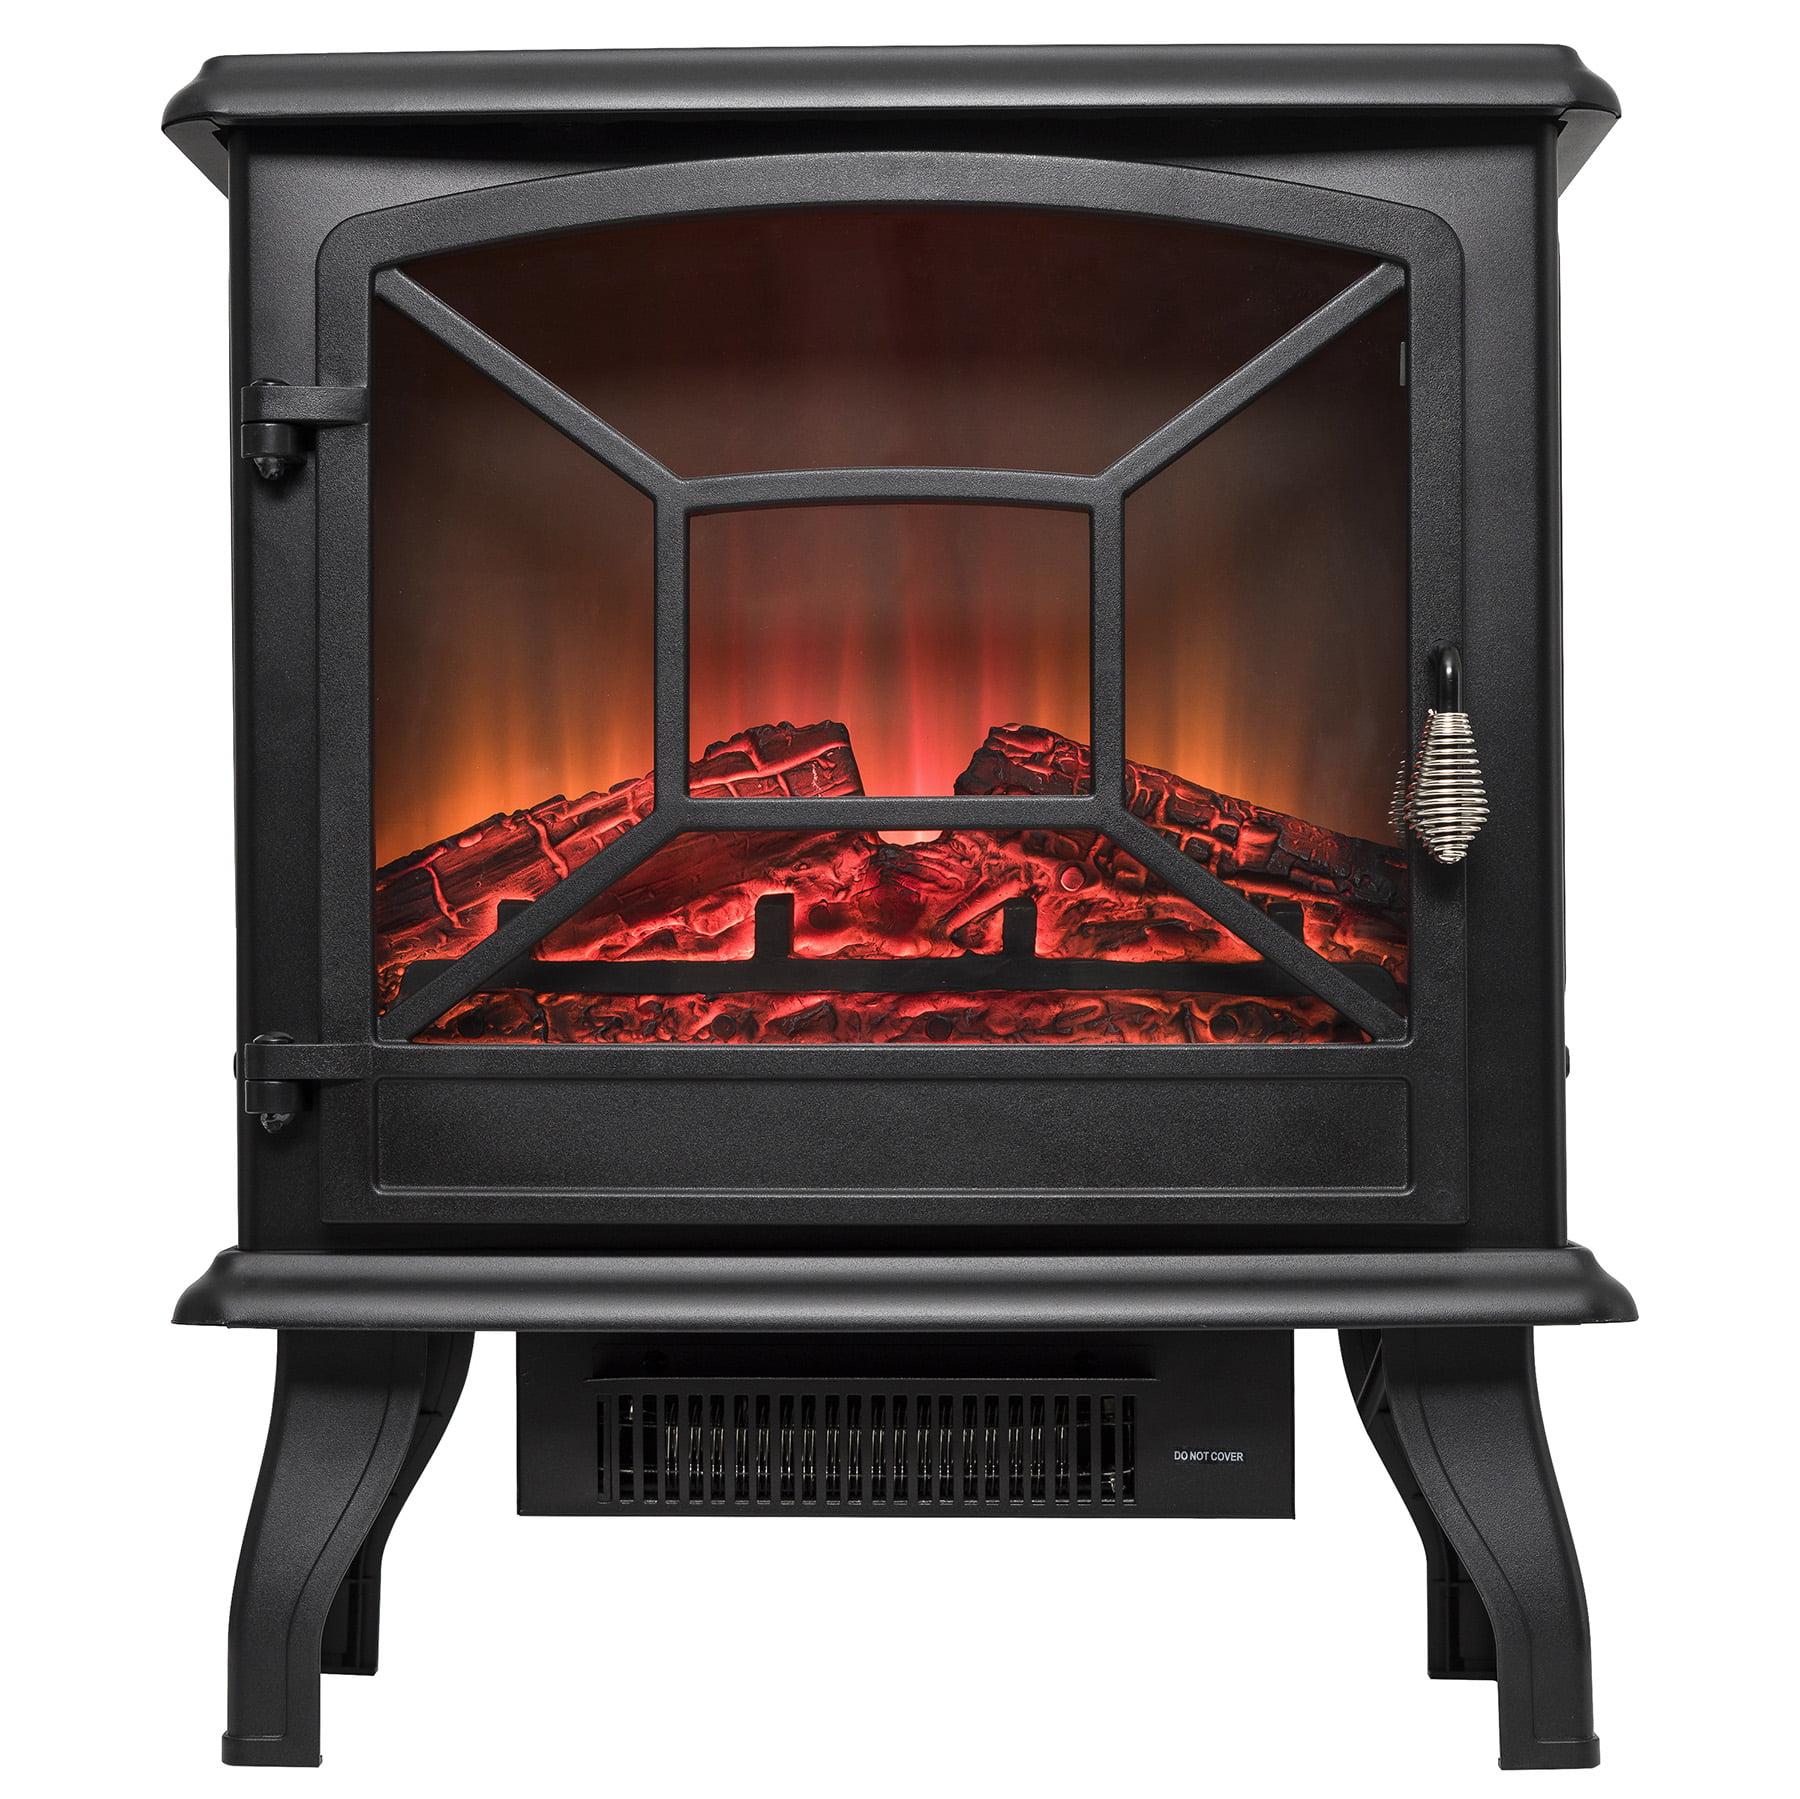 "AKDY FP0081 20"" Freestanding Portable Black Electric Fireplace 3D Flames Firebox Heater w  Logs by AKDY"